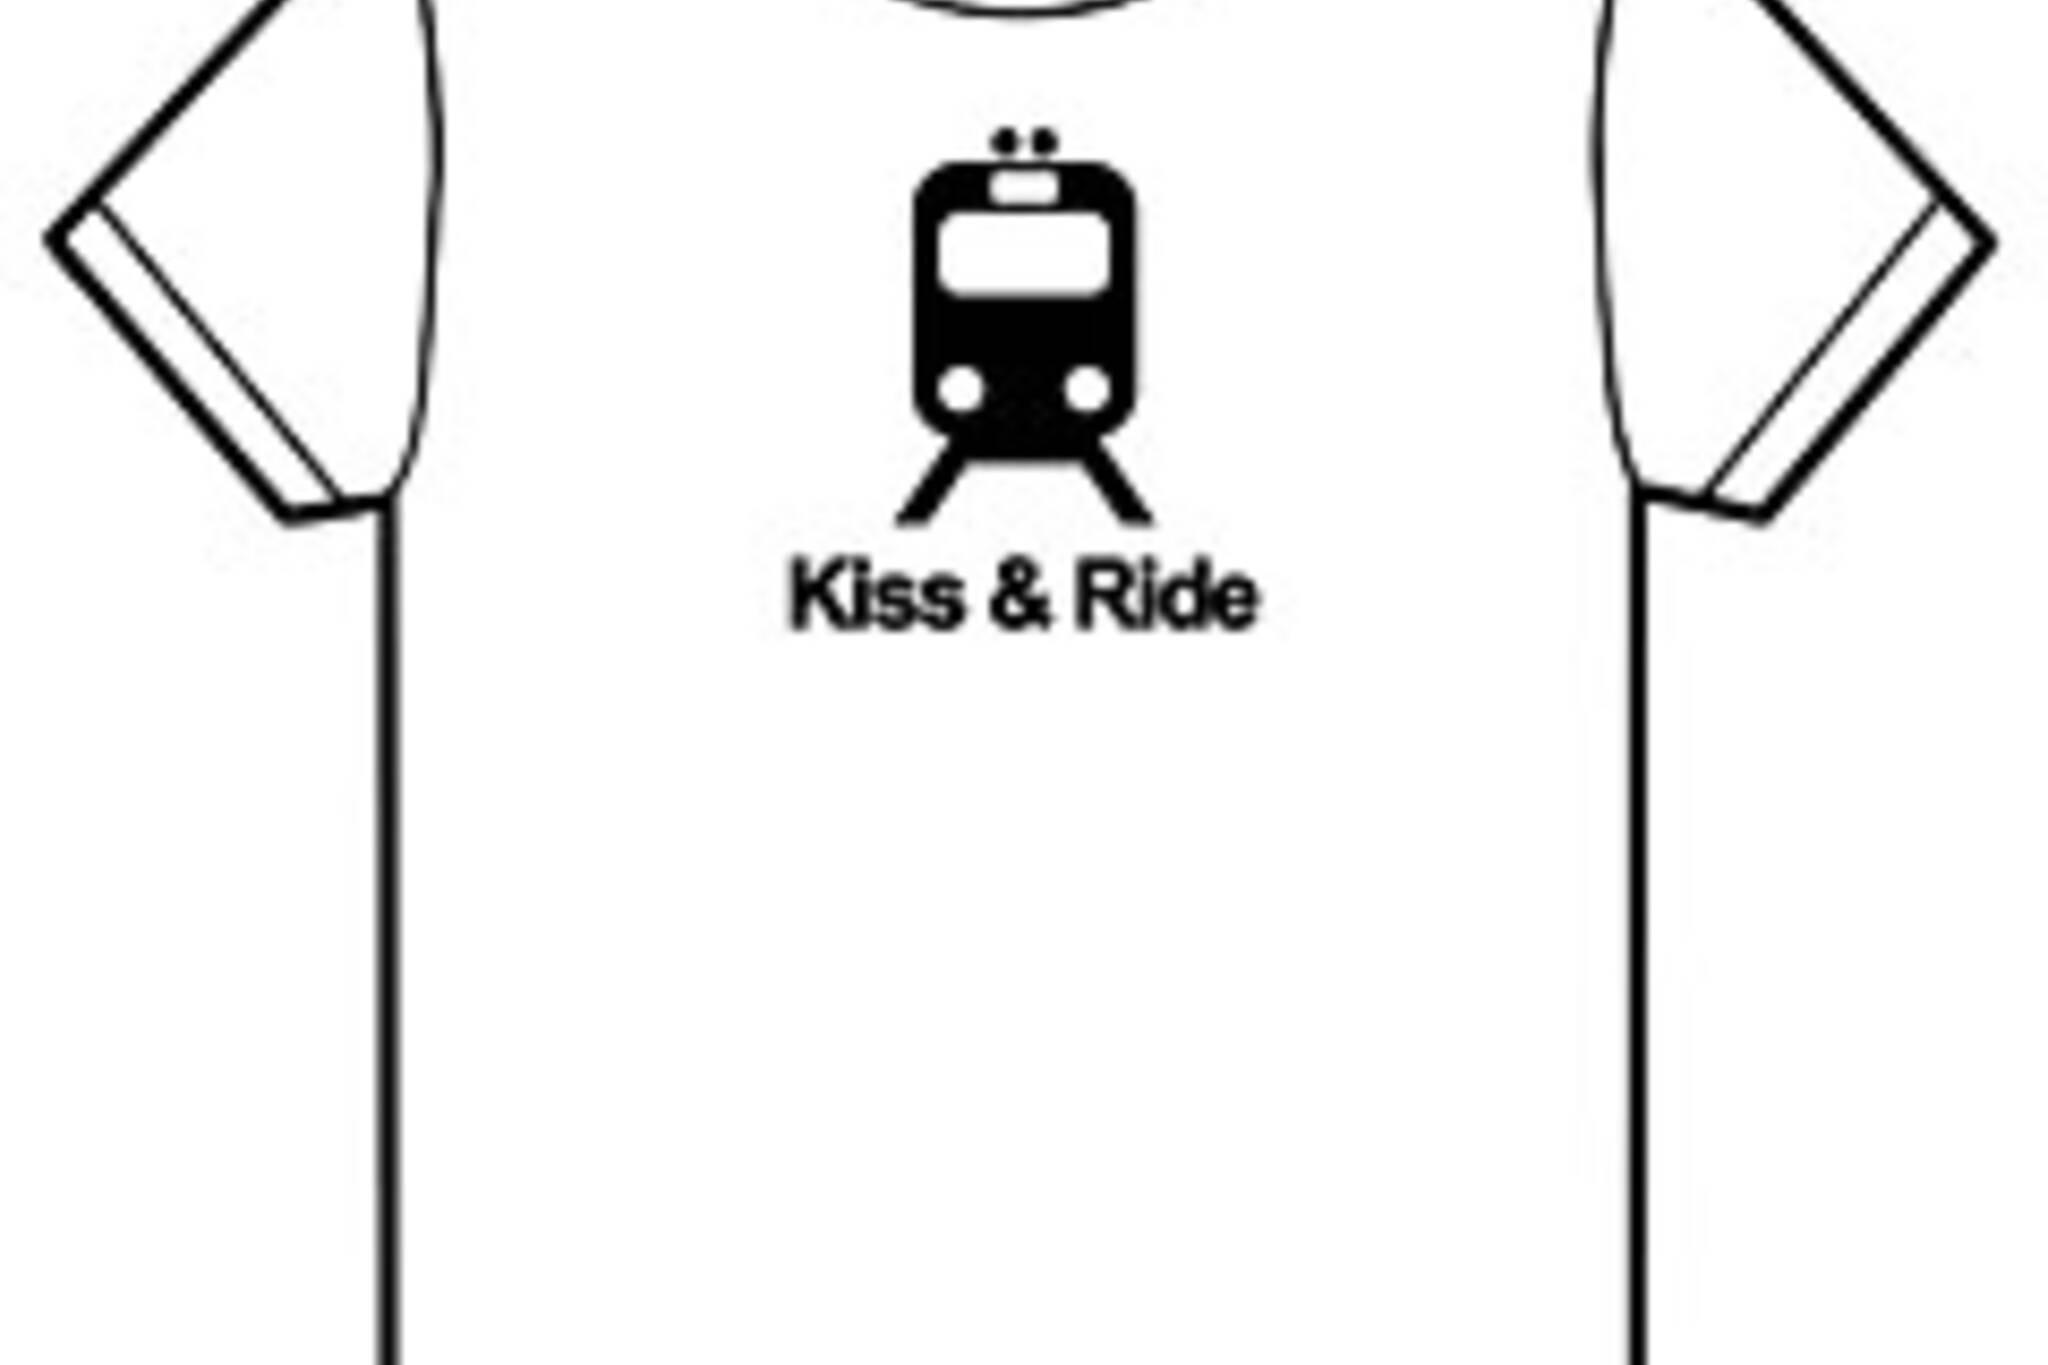 20061003-kissnride.jpg